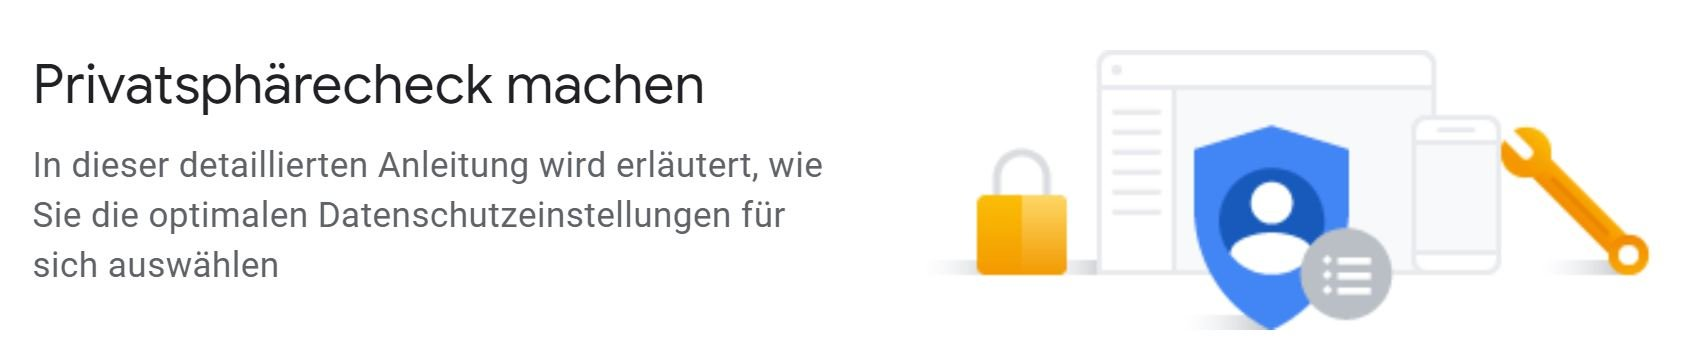 google privacy check